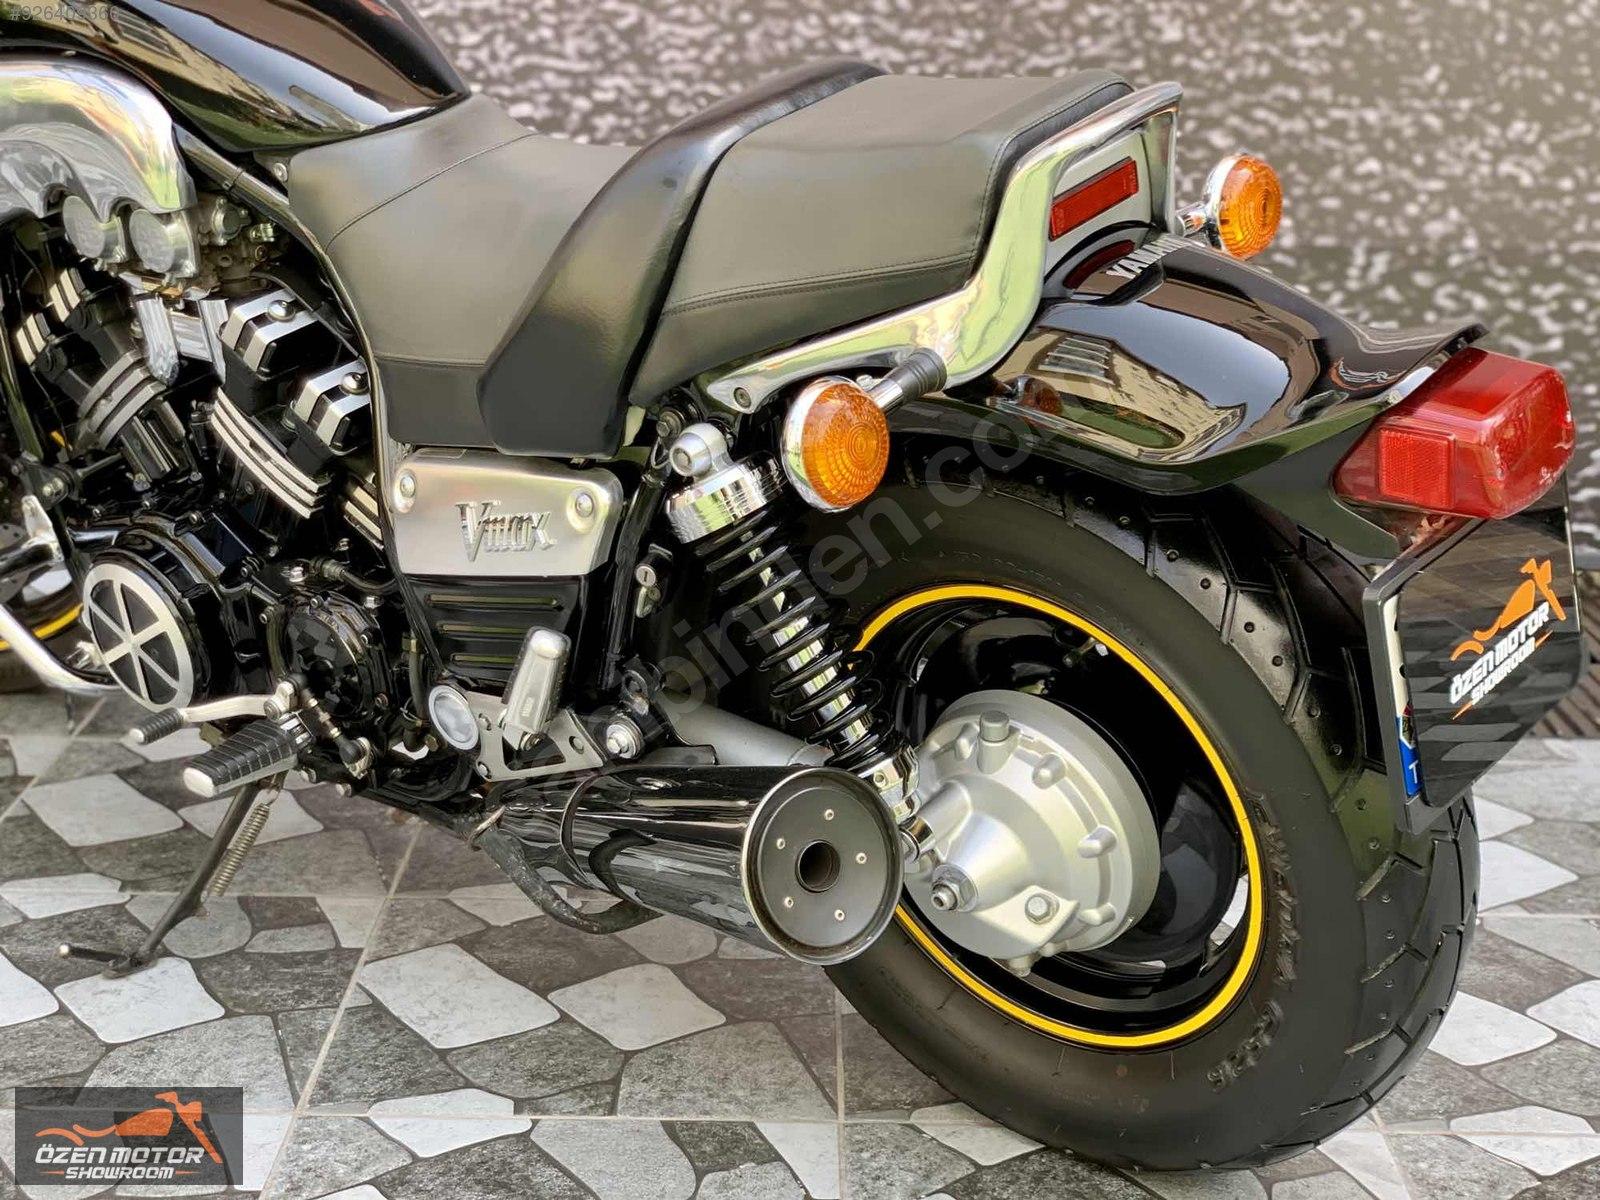 Yamaha Vmax 1997 Model Naked / Roadster Motor Motosiklet